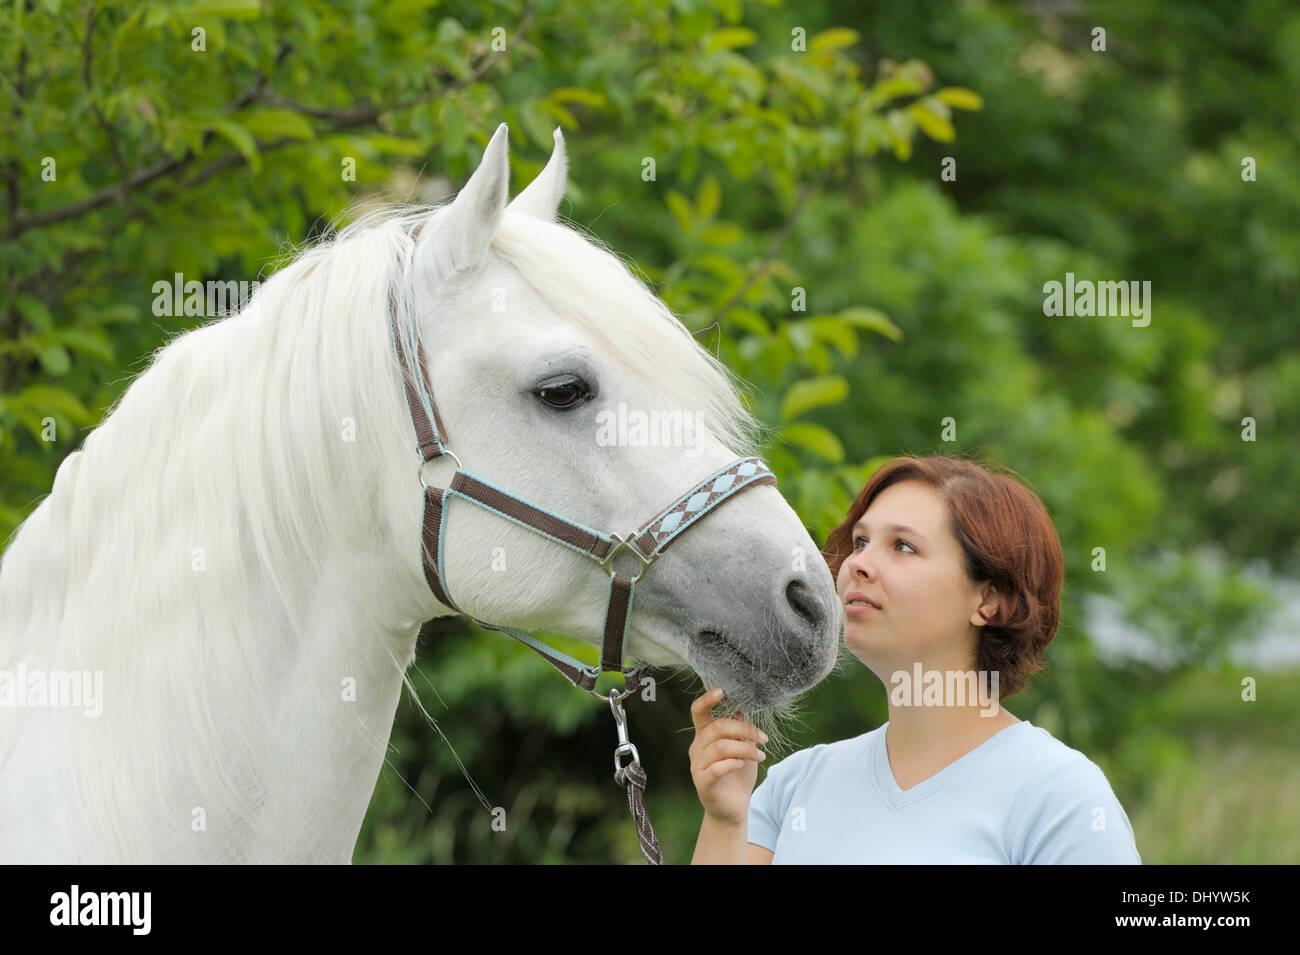 Woman and a Connemara pony stallion - Stock Image